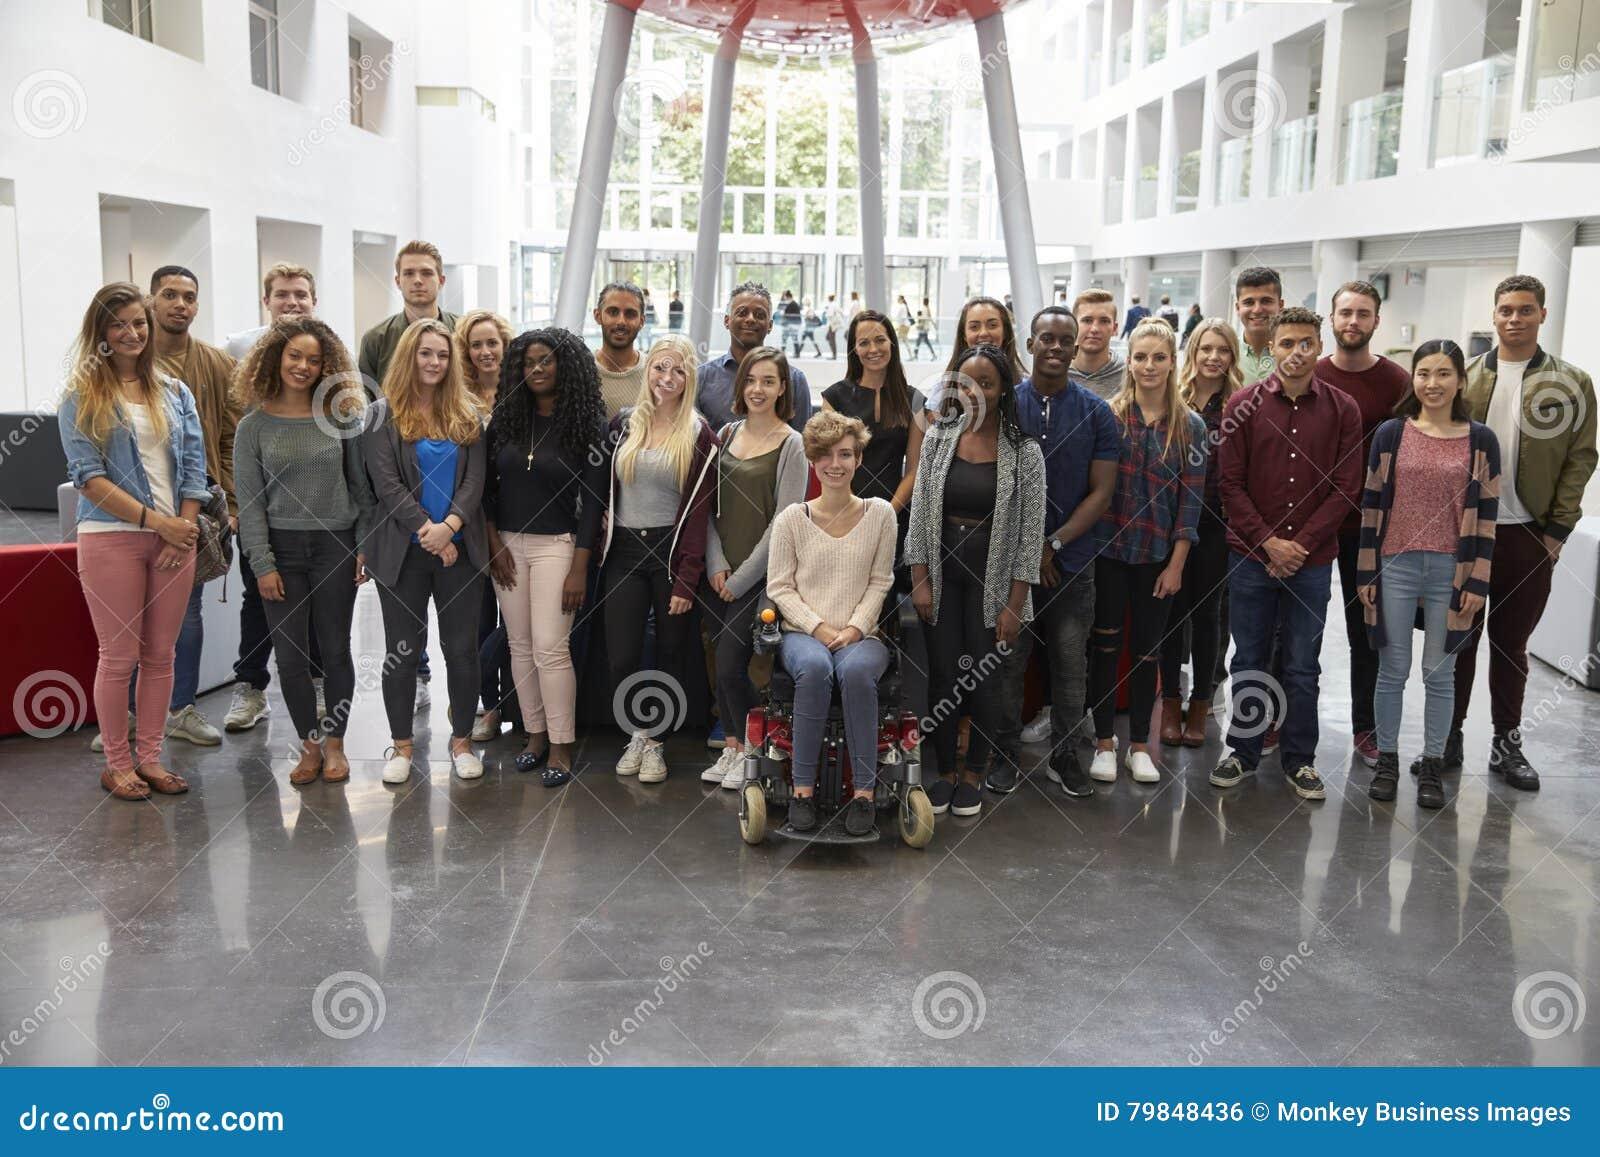 Students in modern university building, large group portrait